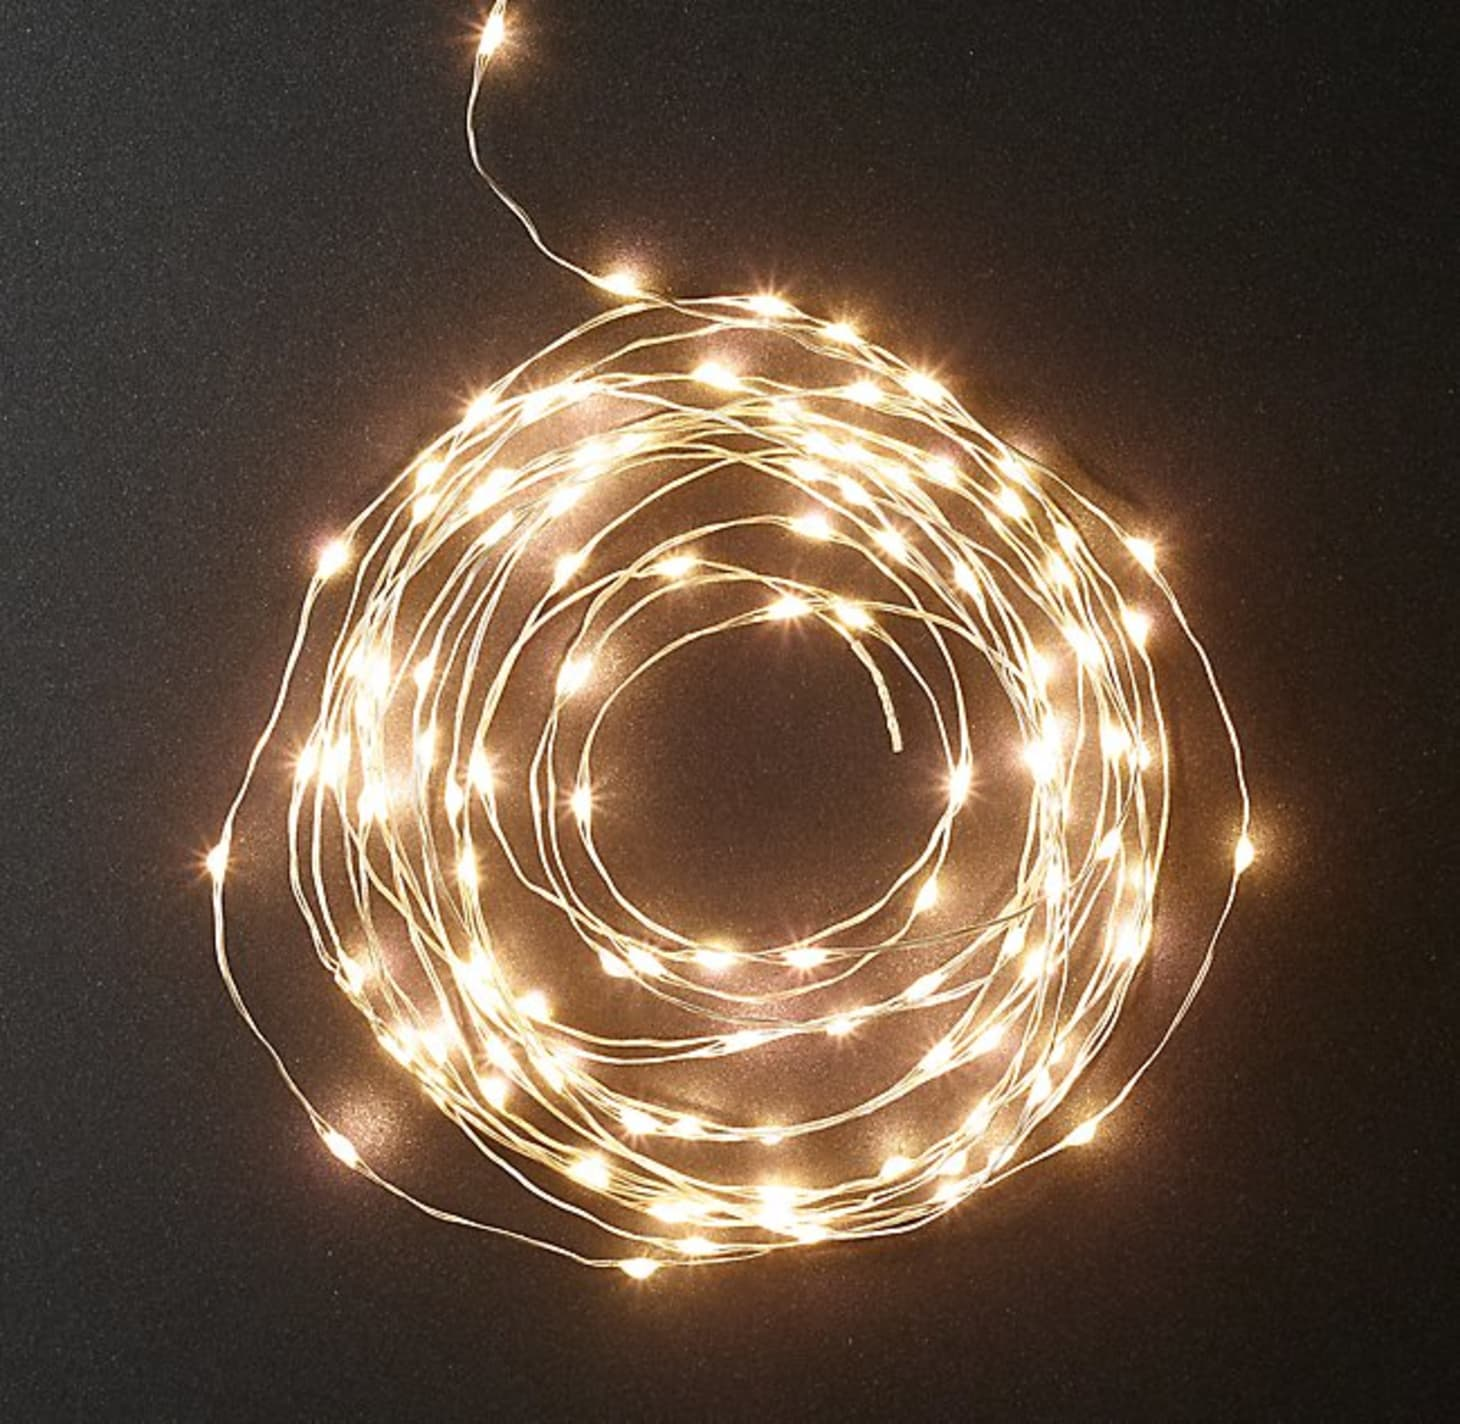 RESTORATION HARDWARE STARRY LIGHT FROST GLOBE STRING LIGHTS ~ SMALL